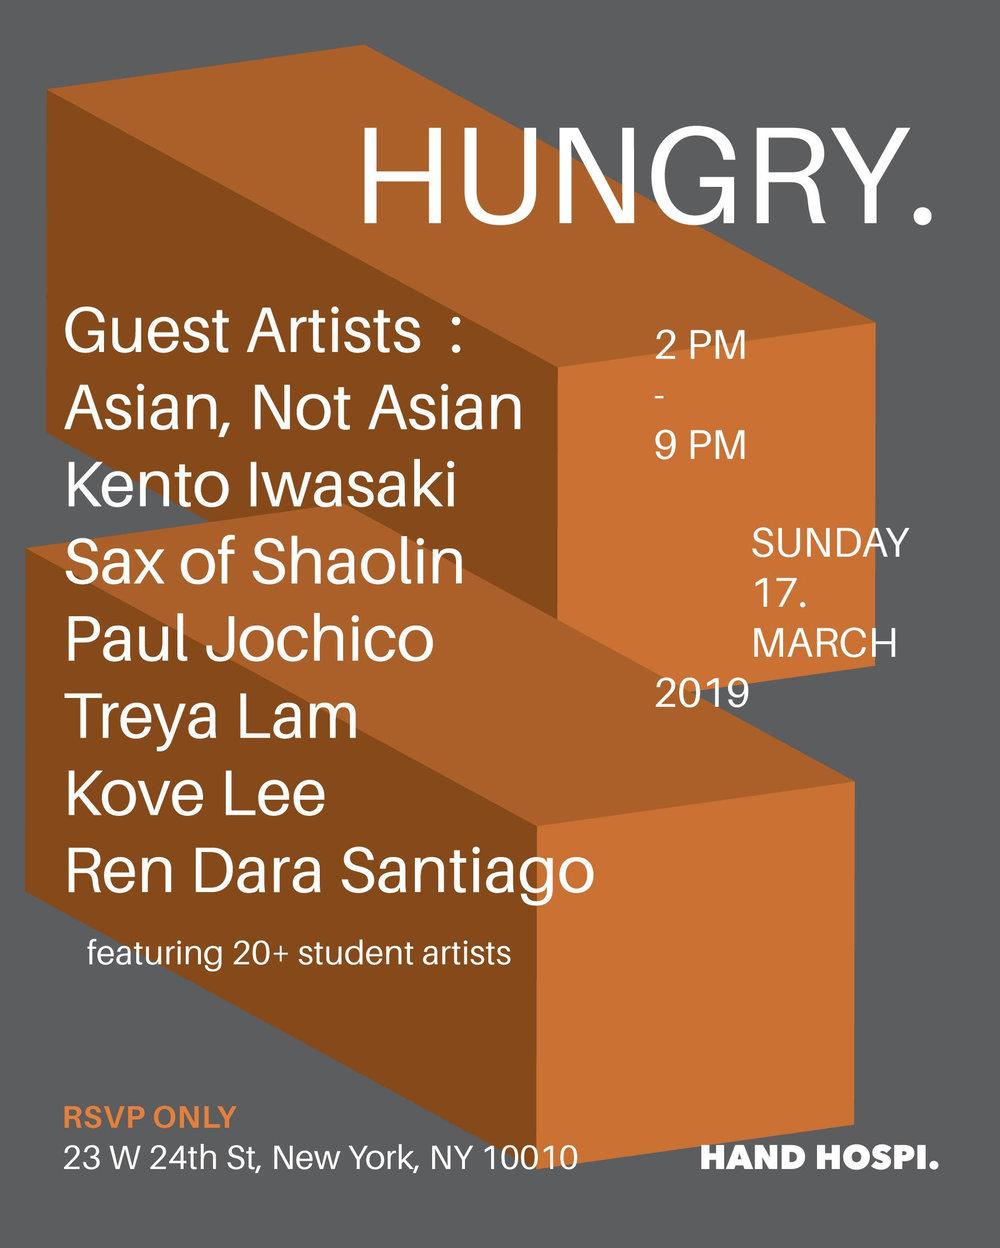 Hungry_Web_Img.jpg